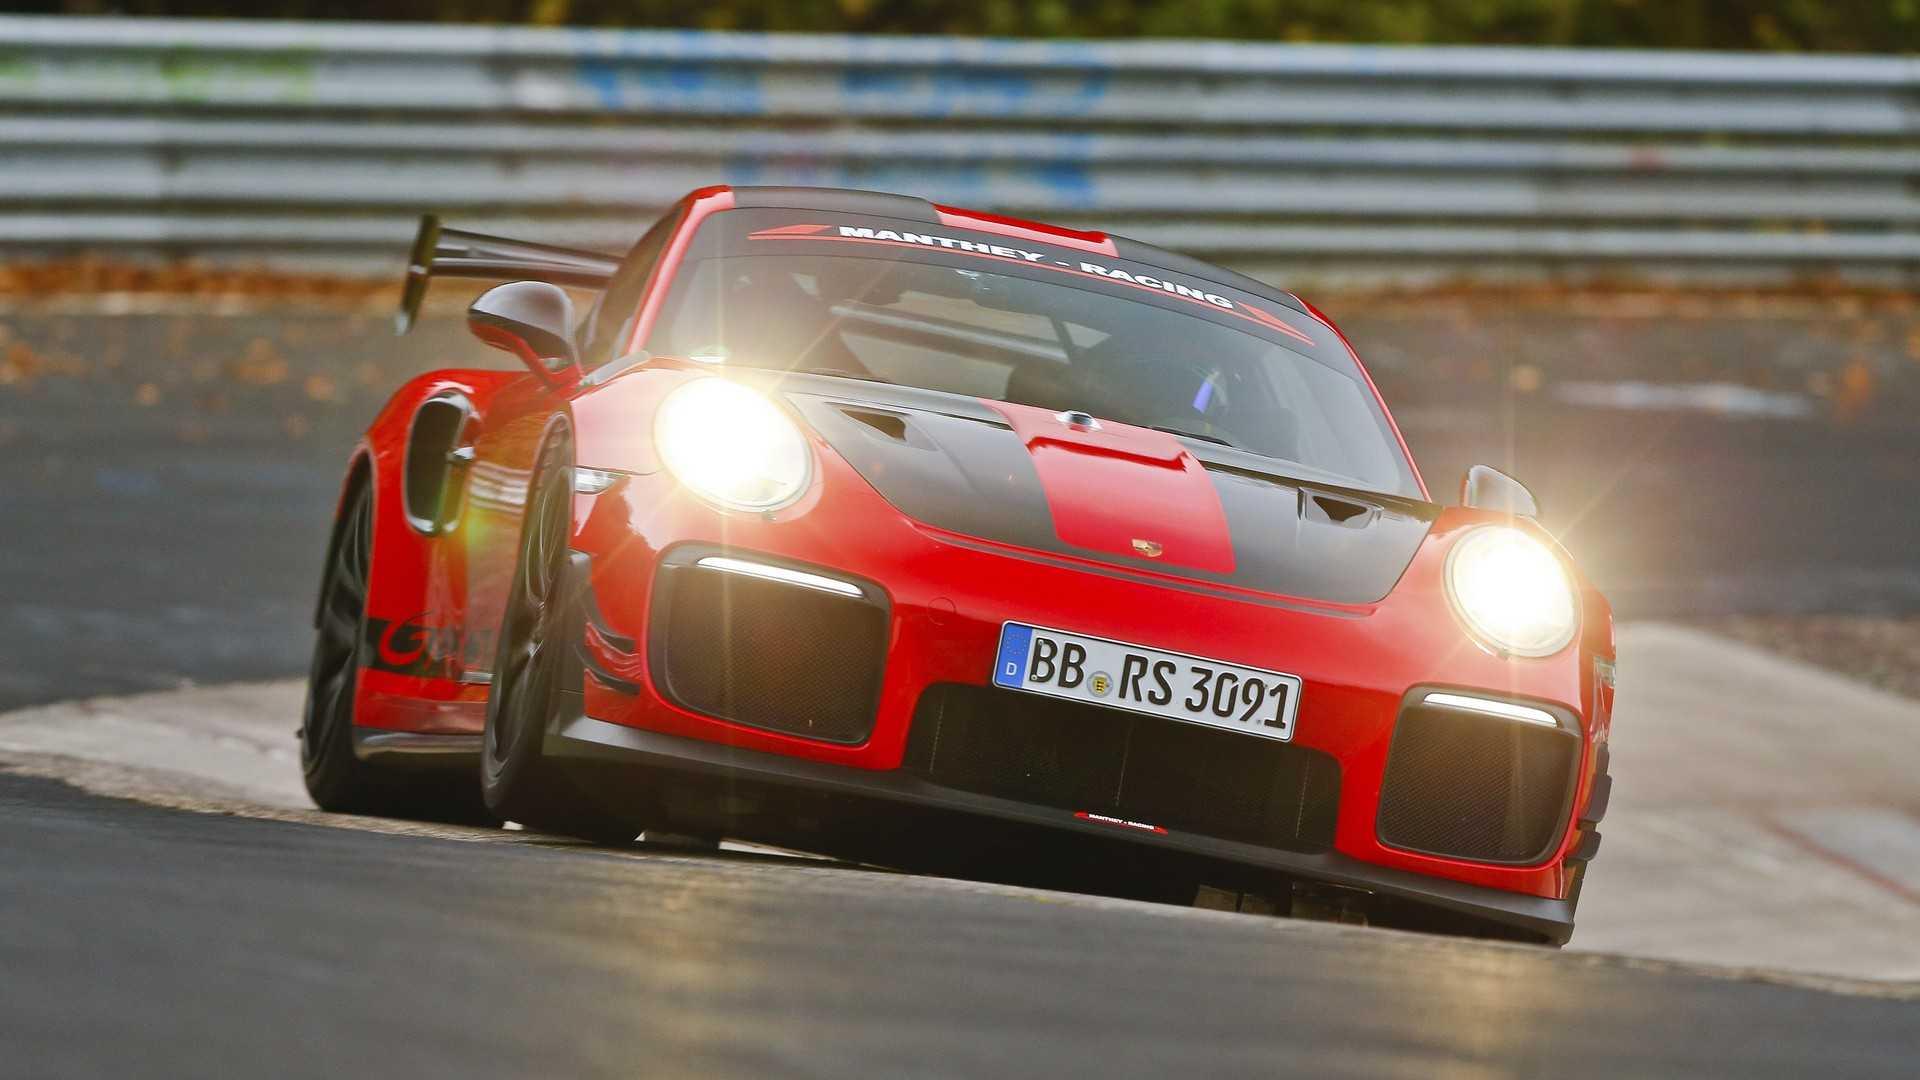 Porsche 911 GT2 RS MR установил новый рекорд круга на Нюрбургринге